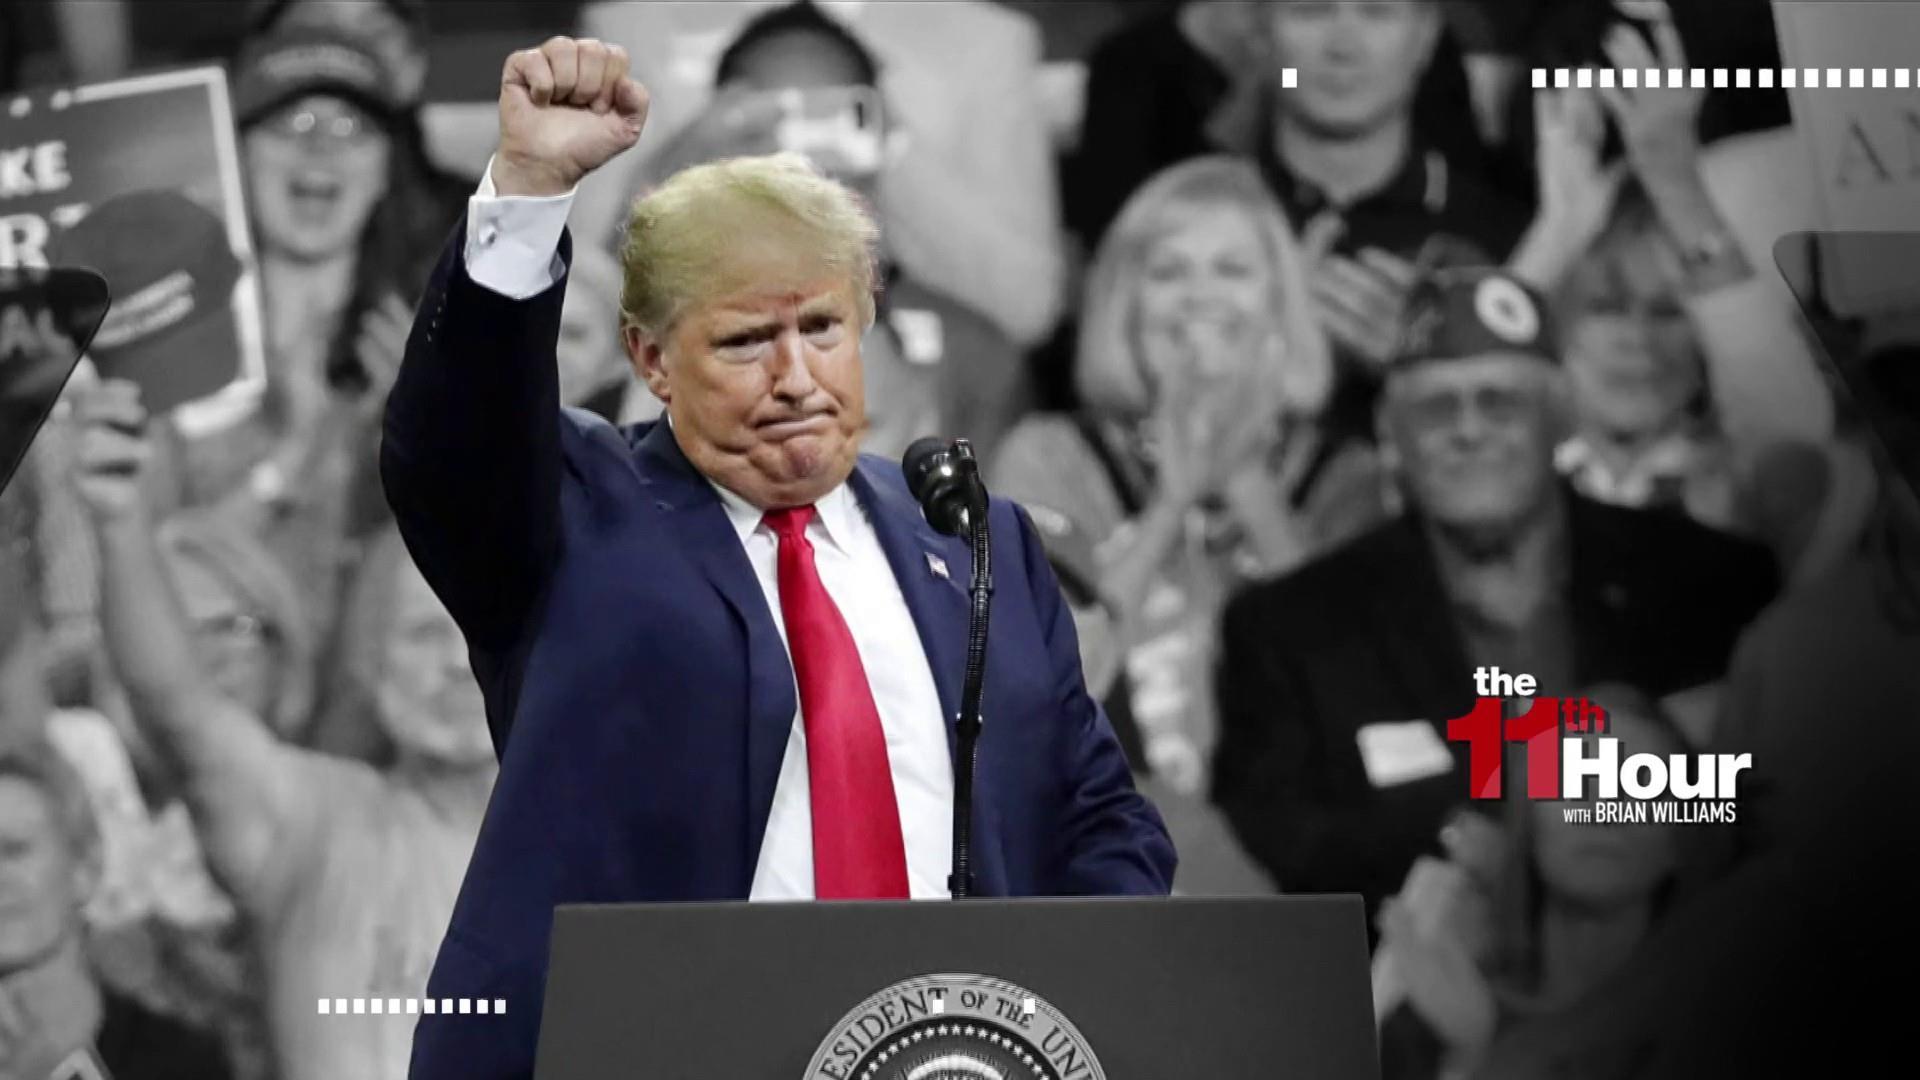 Schmidt on Trump attacking Dr. Blasey Ford: Contemptible & vulgar